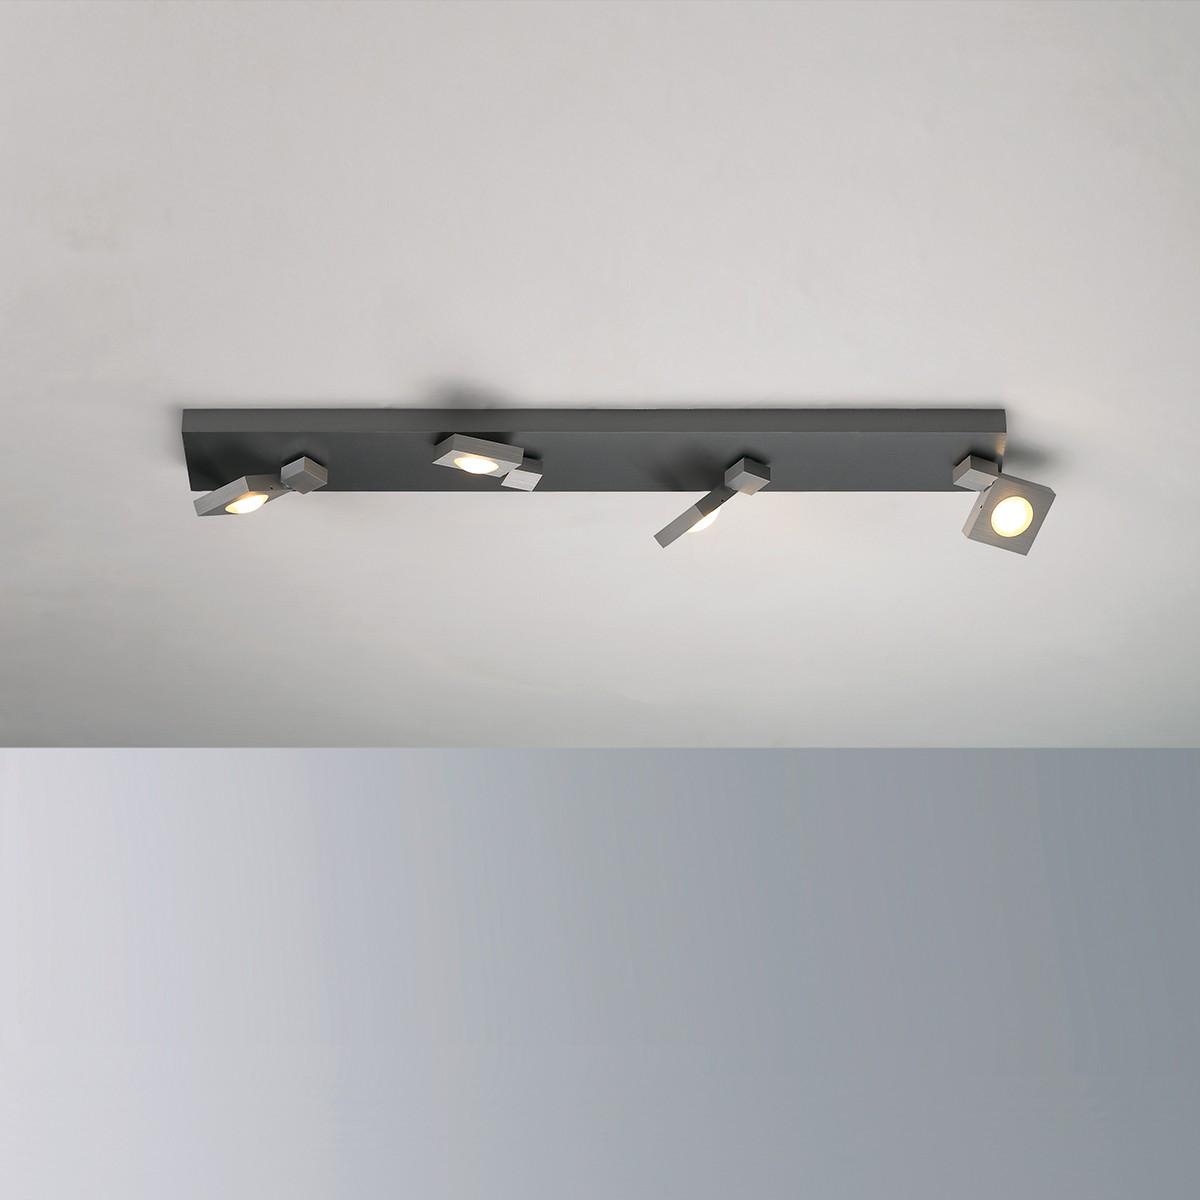 Bopp Flash LED Deckenleuchte 4-flg., Aluminium geschliffen - anthrazit lackiert